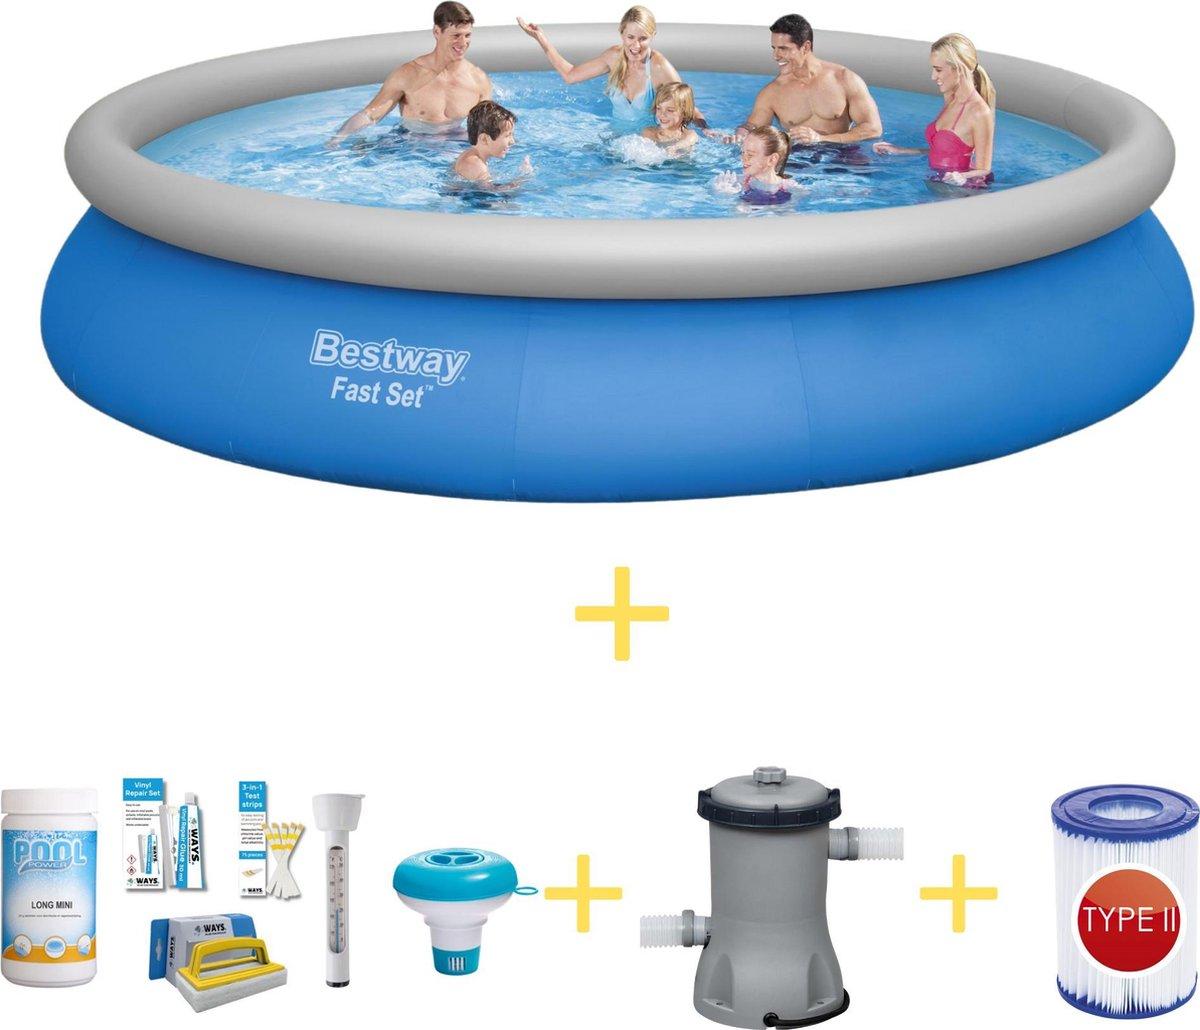 Bestway Zwembad - Fast Set - 457 x 84 cm - Inclusief WAYS Onderhoudspakket, Filterpomp & Grondzeil